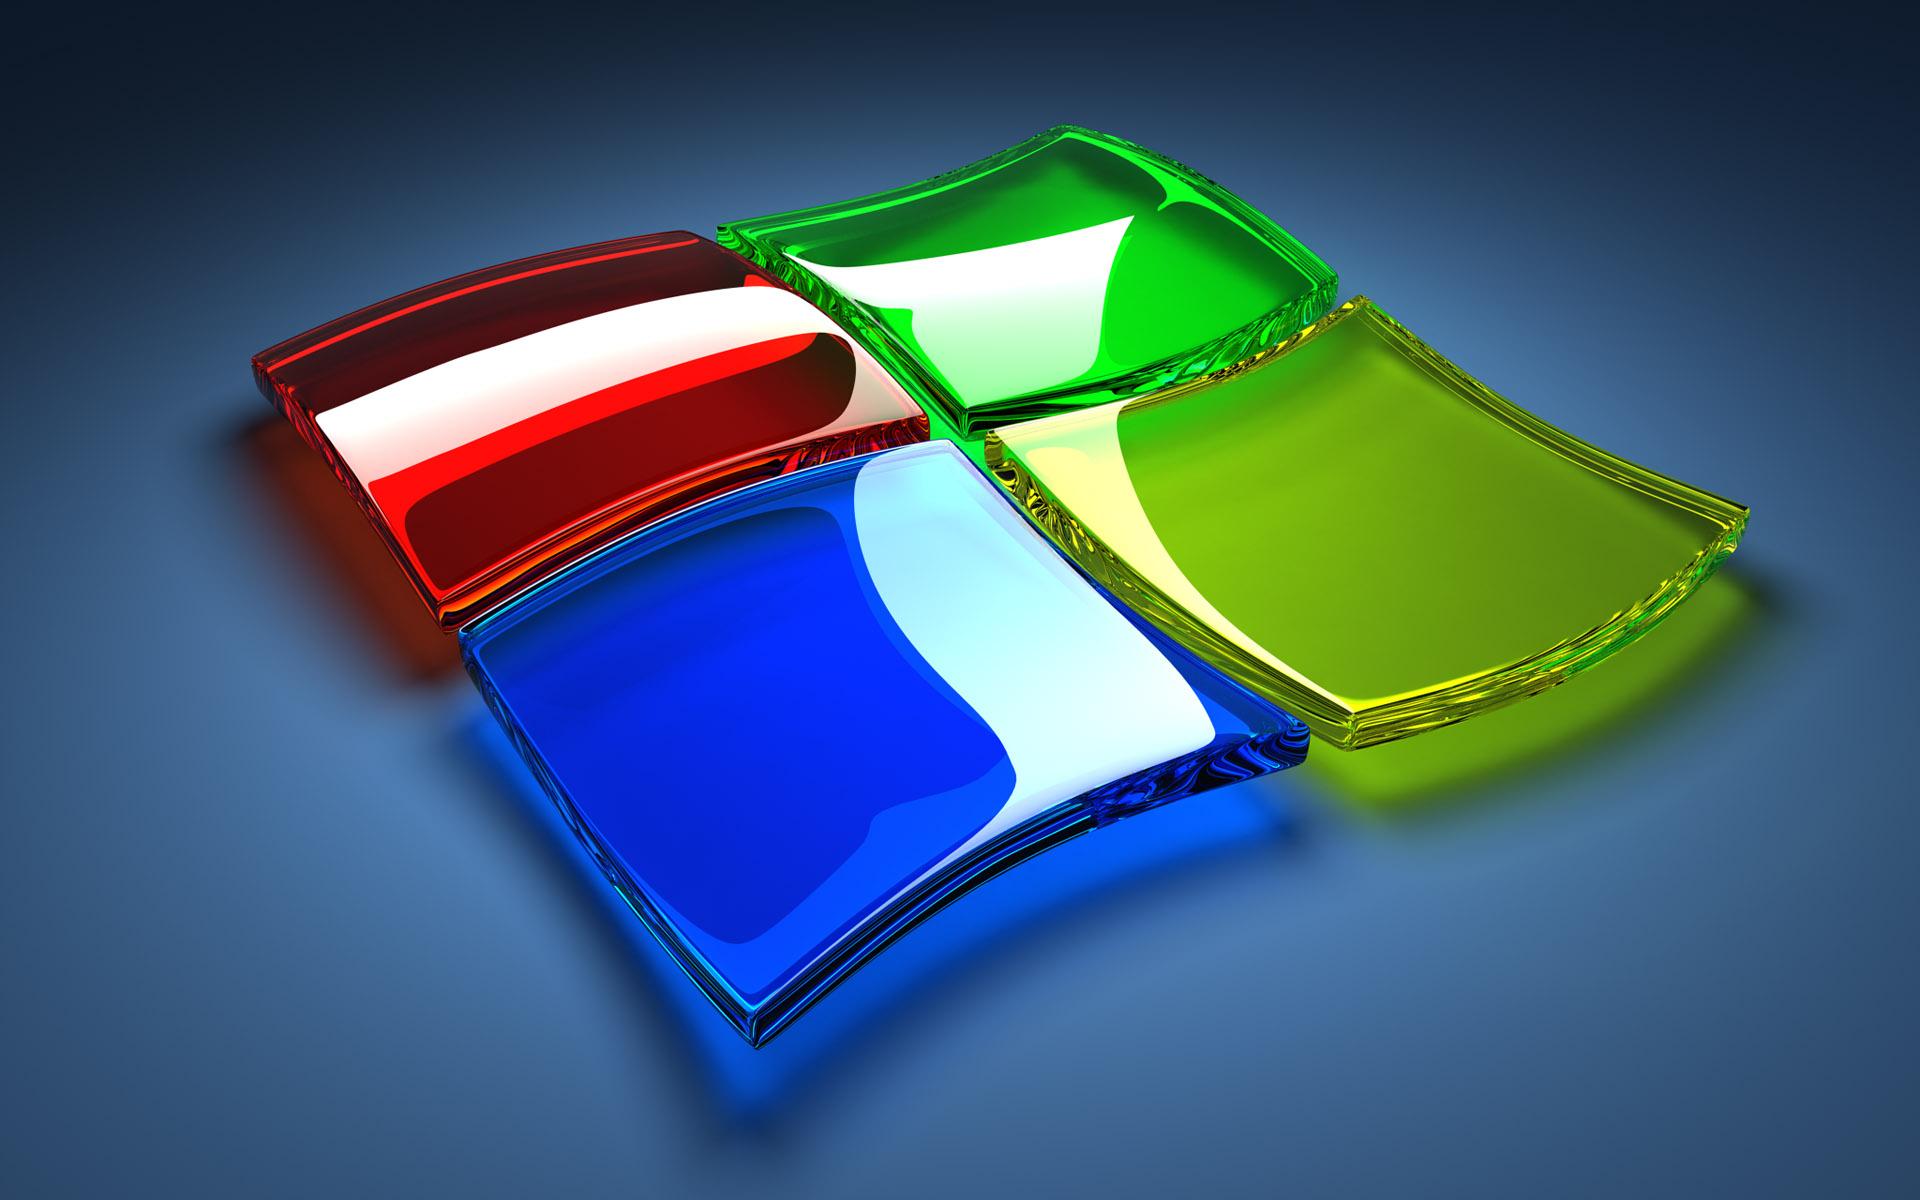 Hd Wallpapers For Windows Windows 8 Wallpaper Hd 12 HD 1920x1200